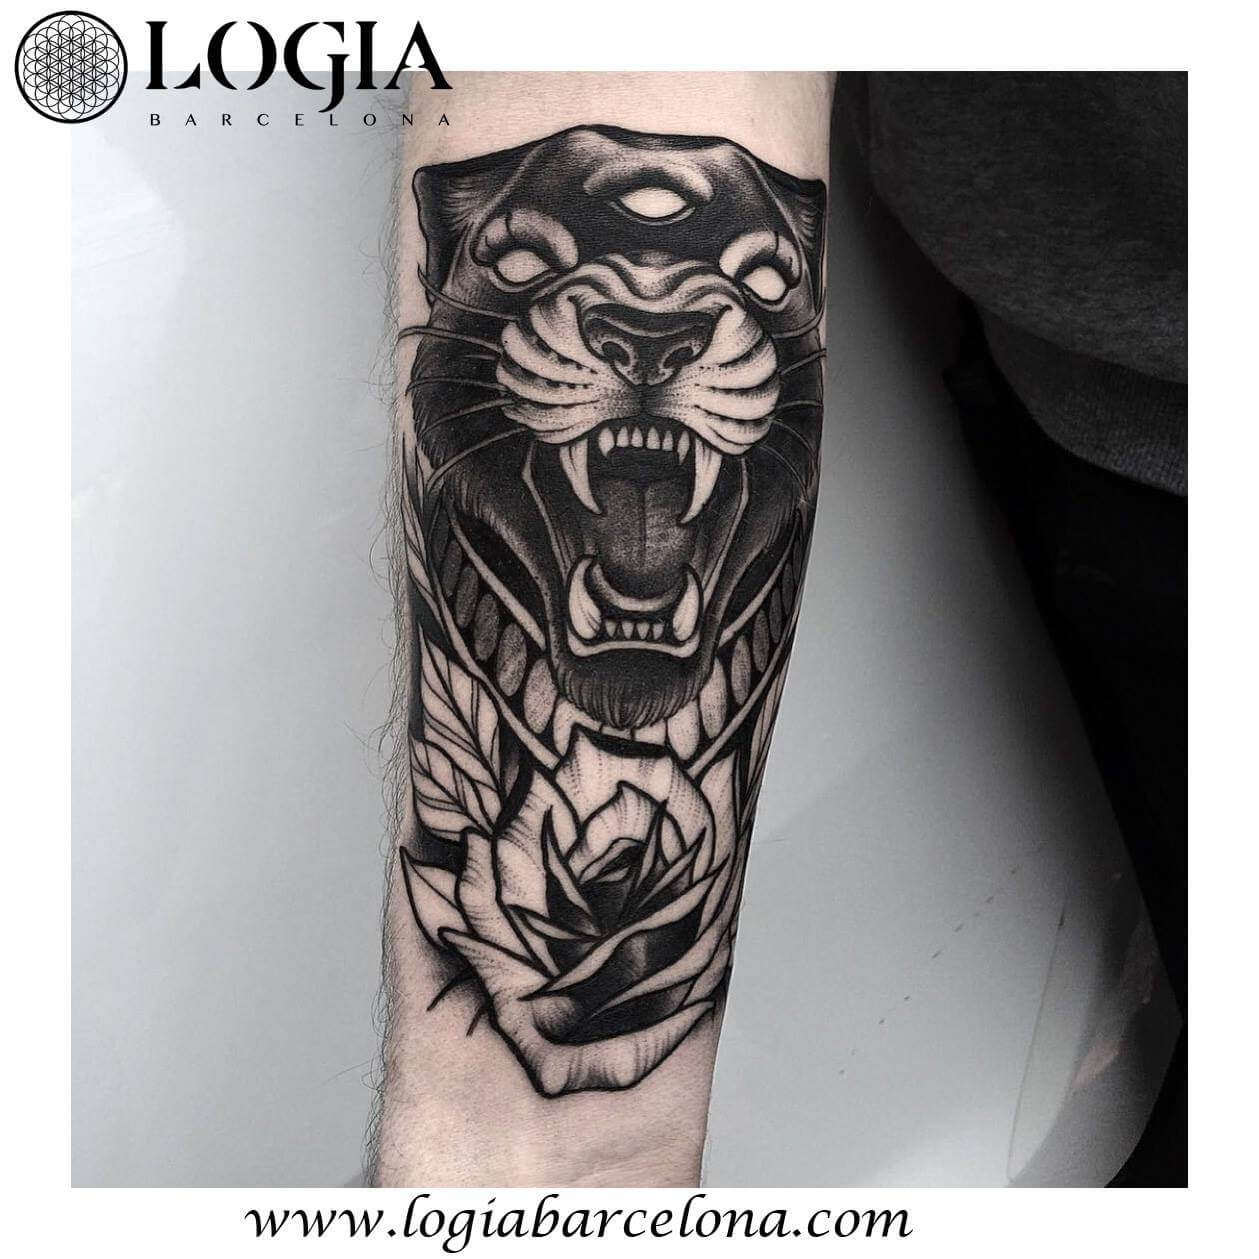 Los tatuajes tailandeses